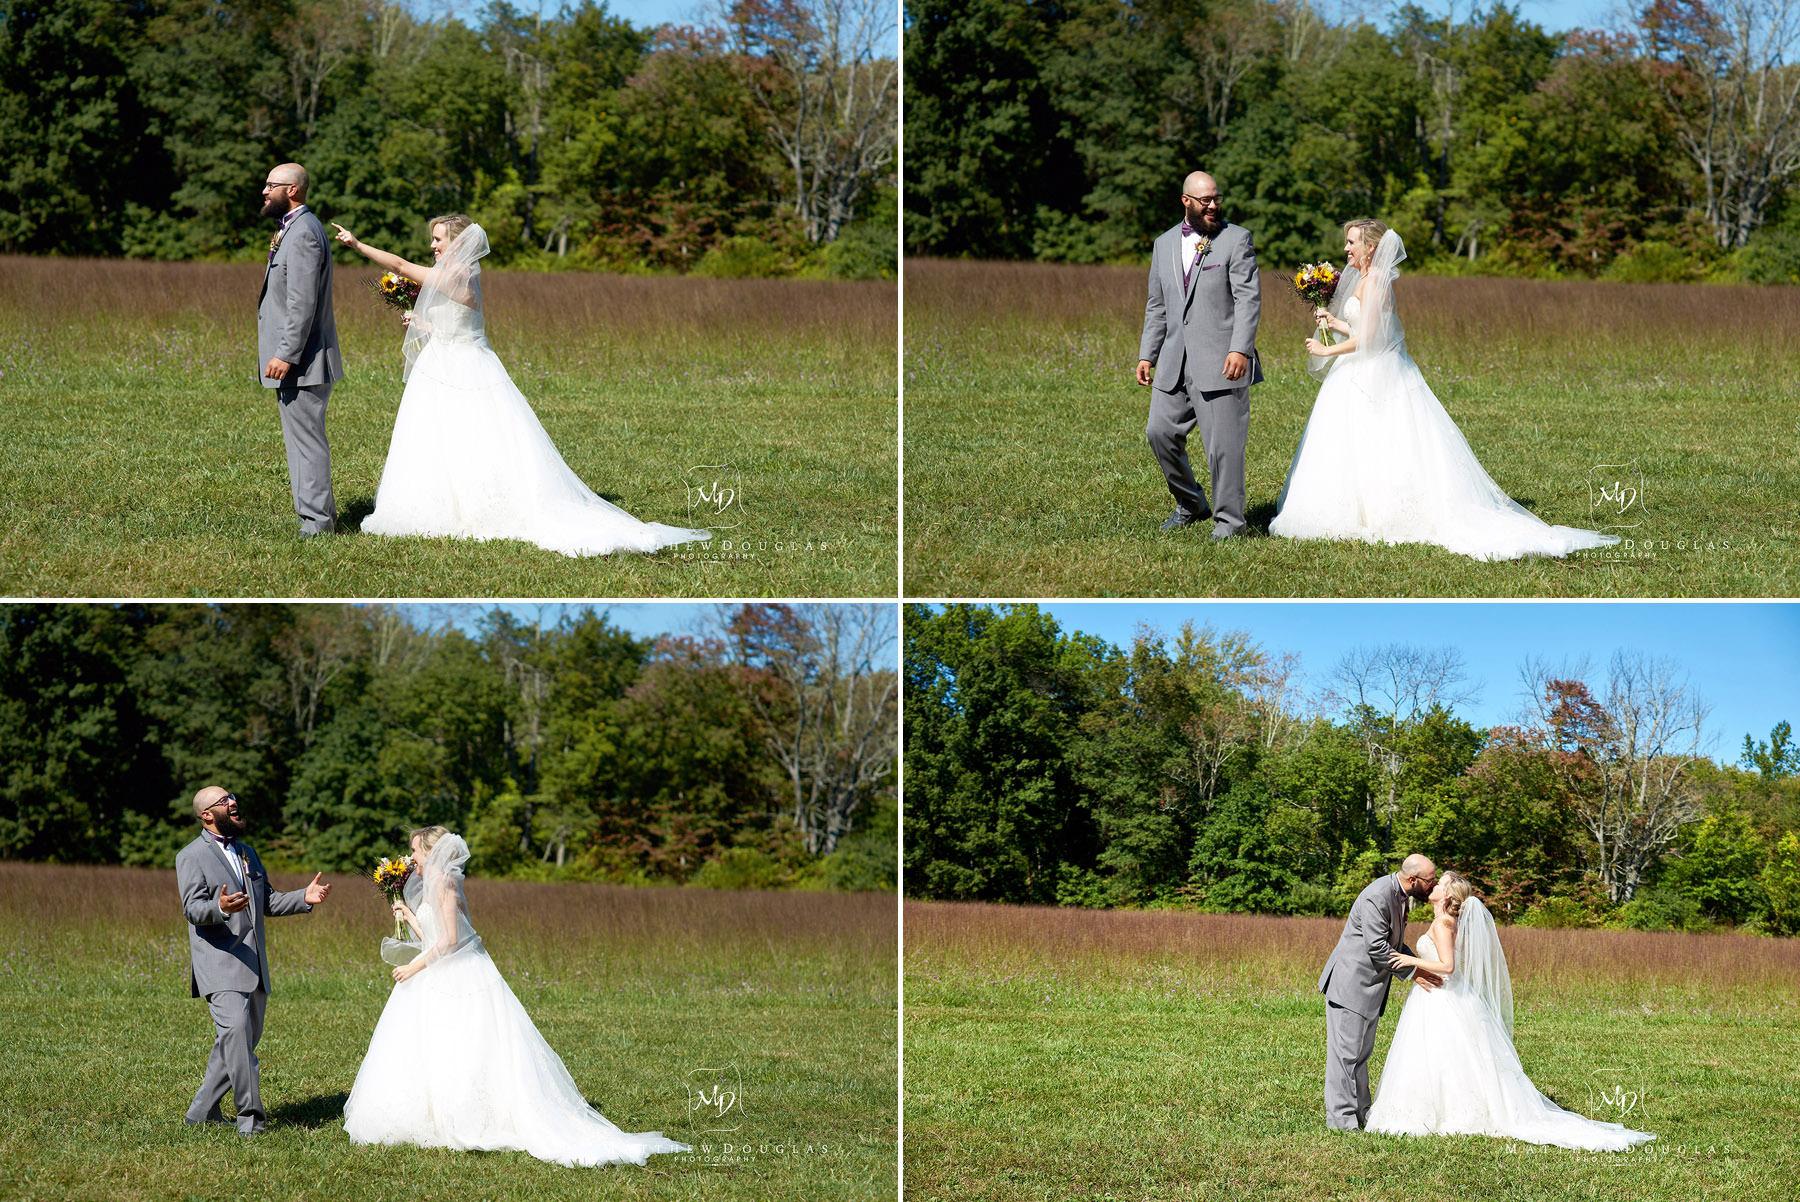 wedding first look at brady life camp